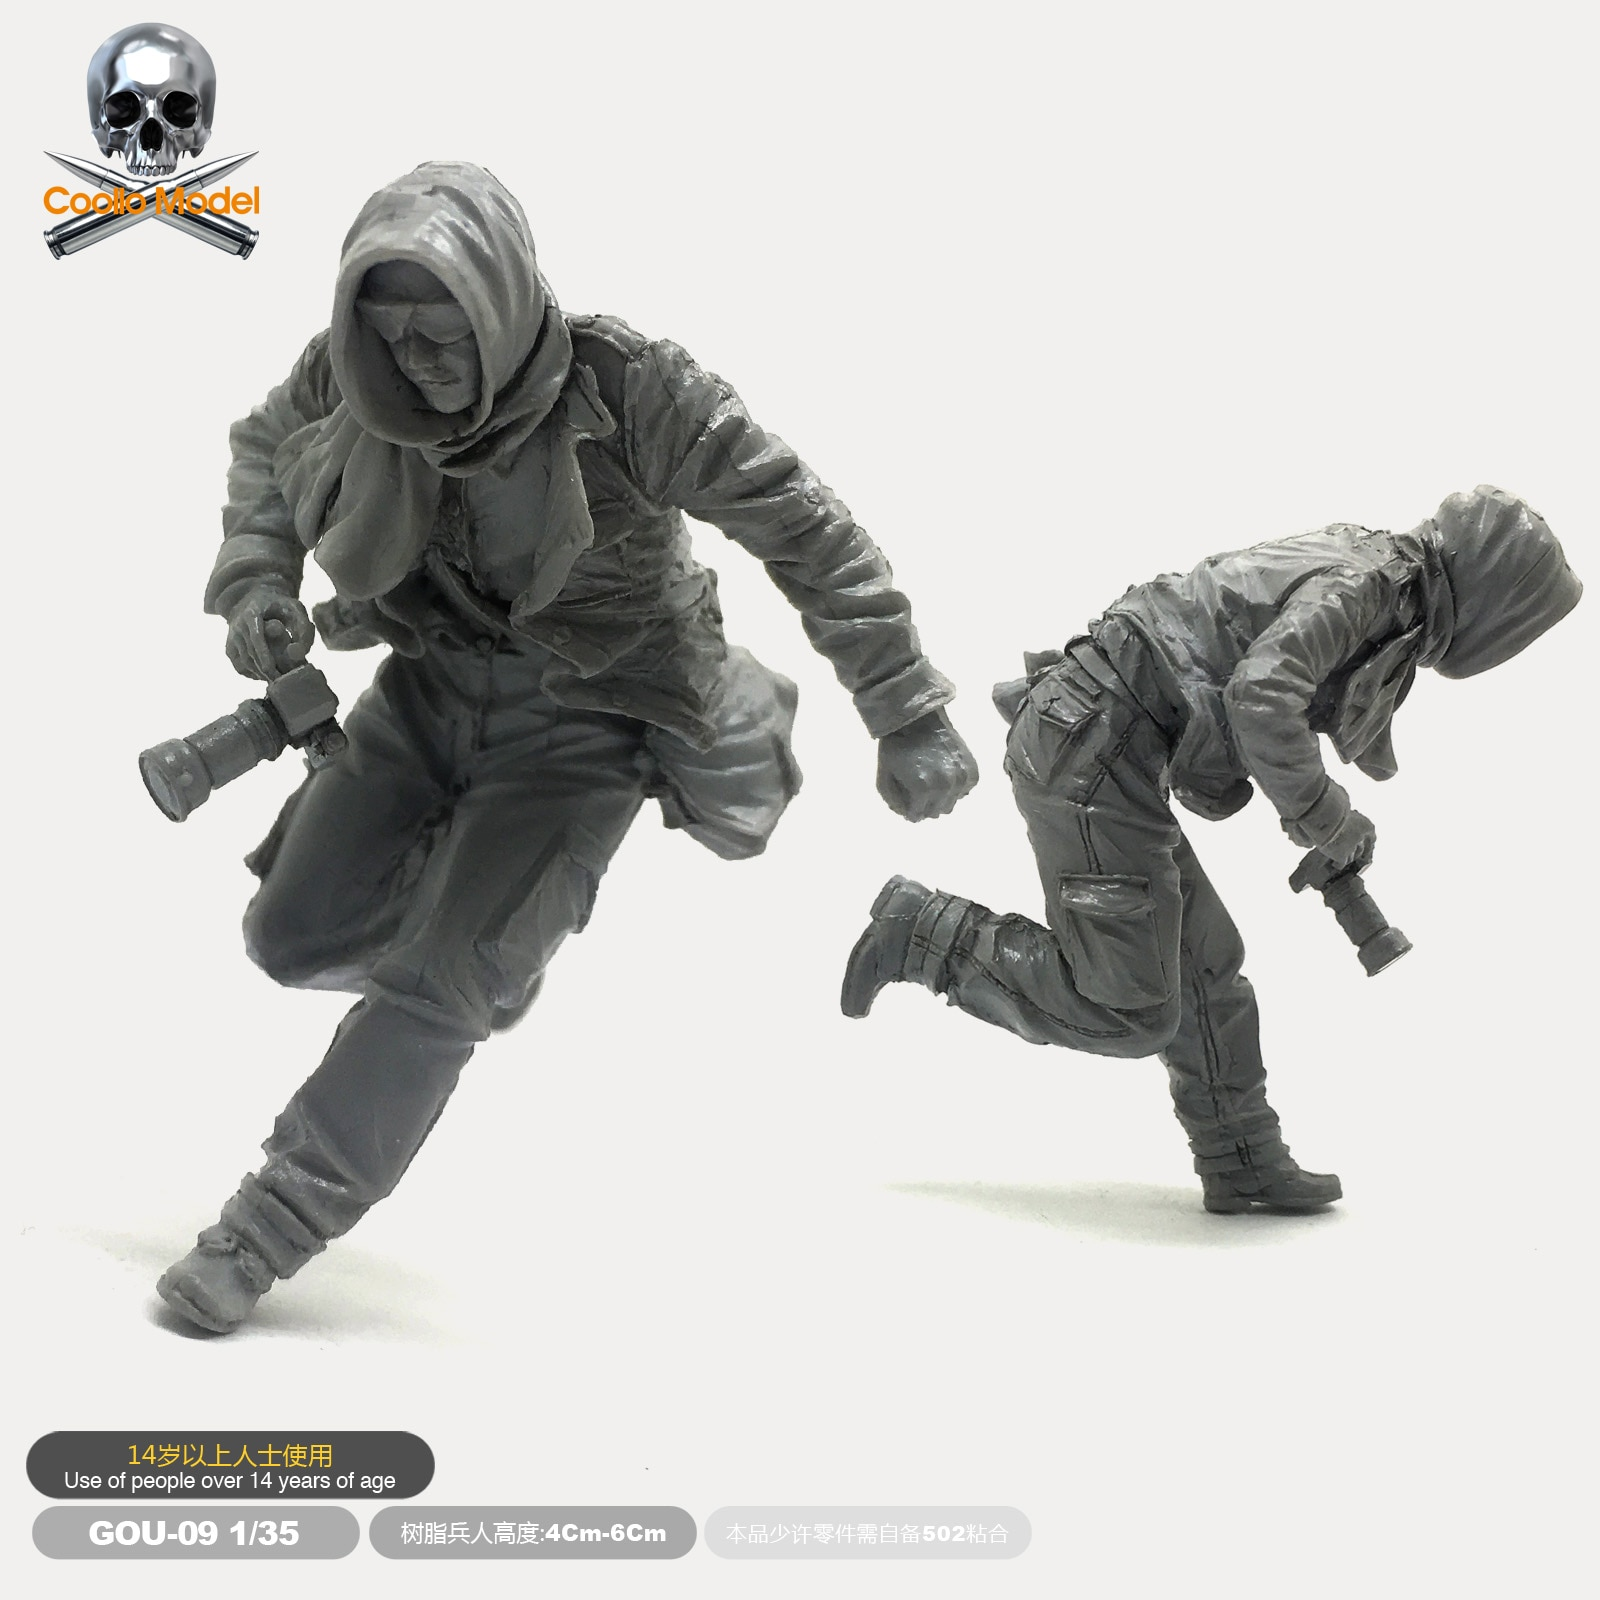 1/35 Resin Figure Soldier Model Kits  Iraqi Field Journalist Gou-09